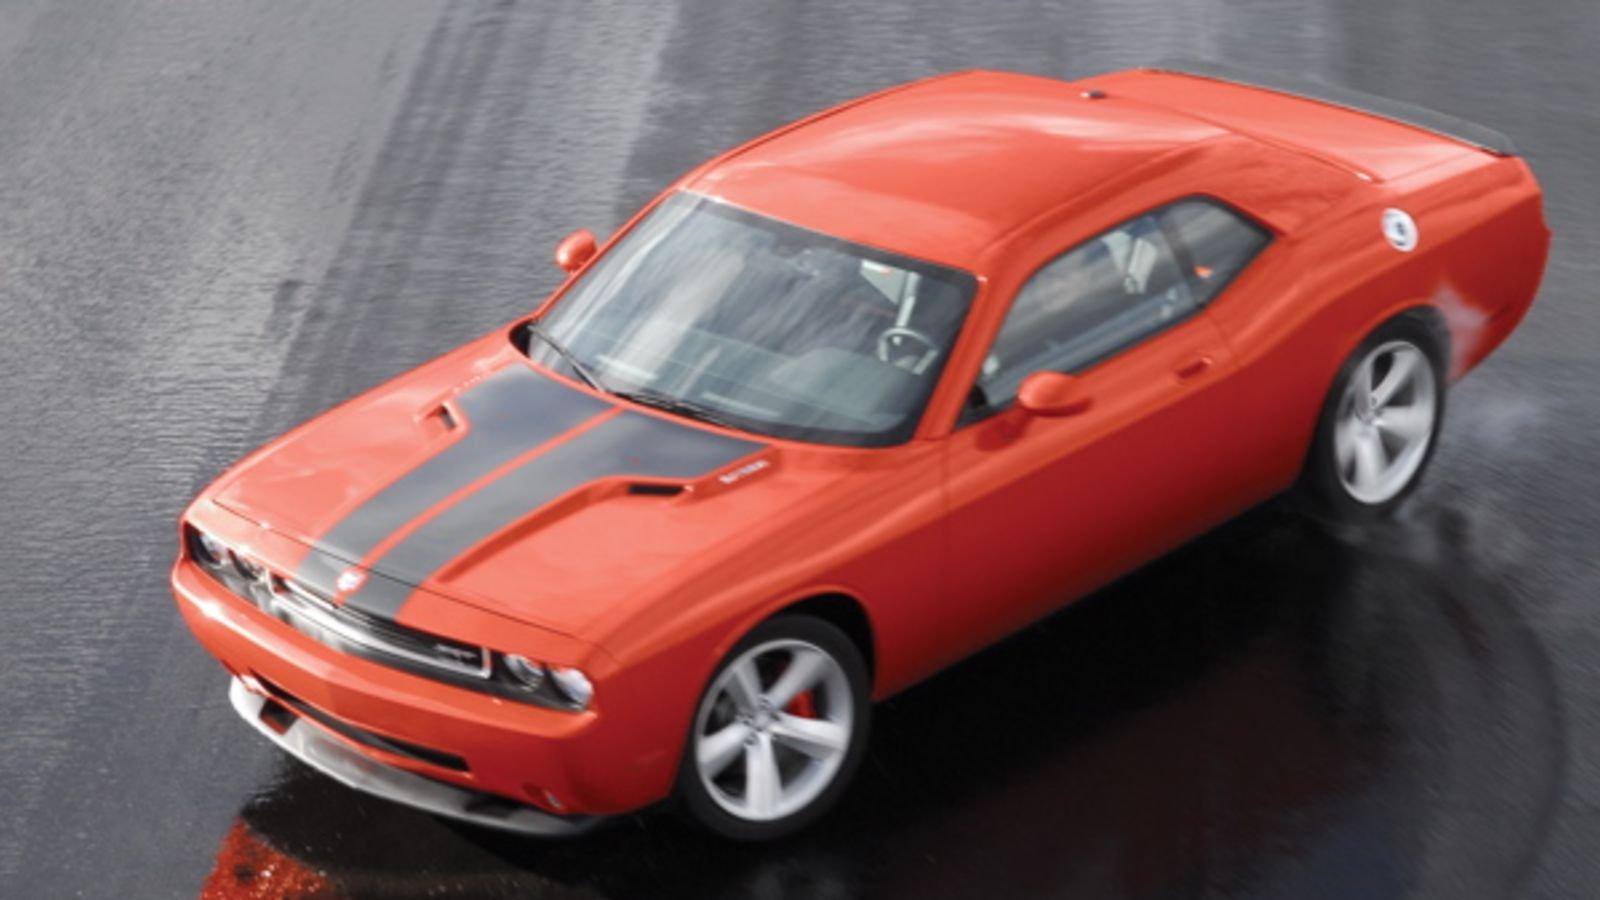 Dodge Charger SRT8 cơ bắp mạnh mẽ